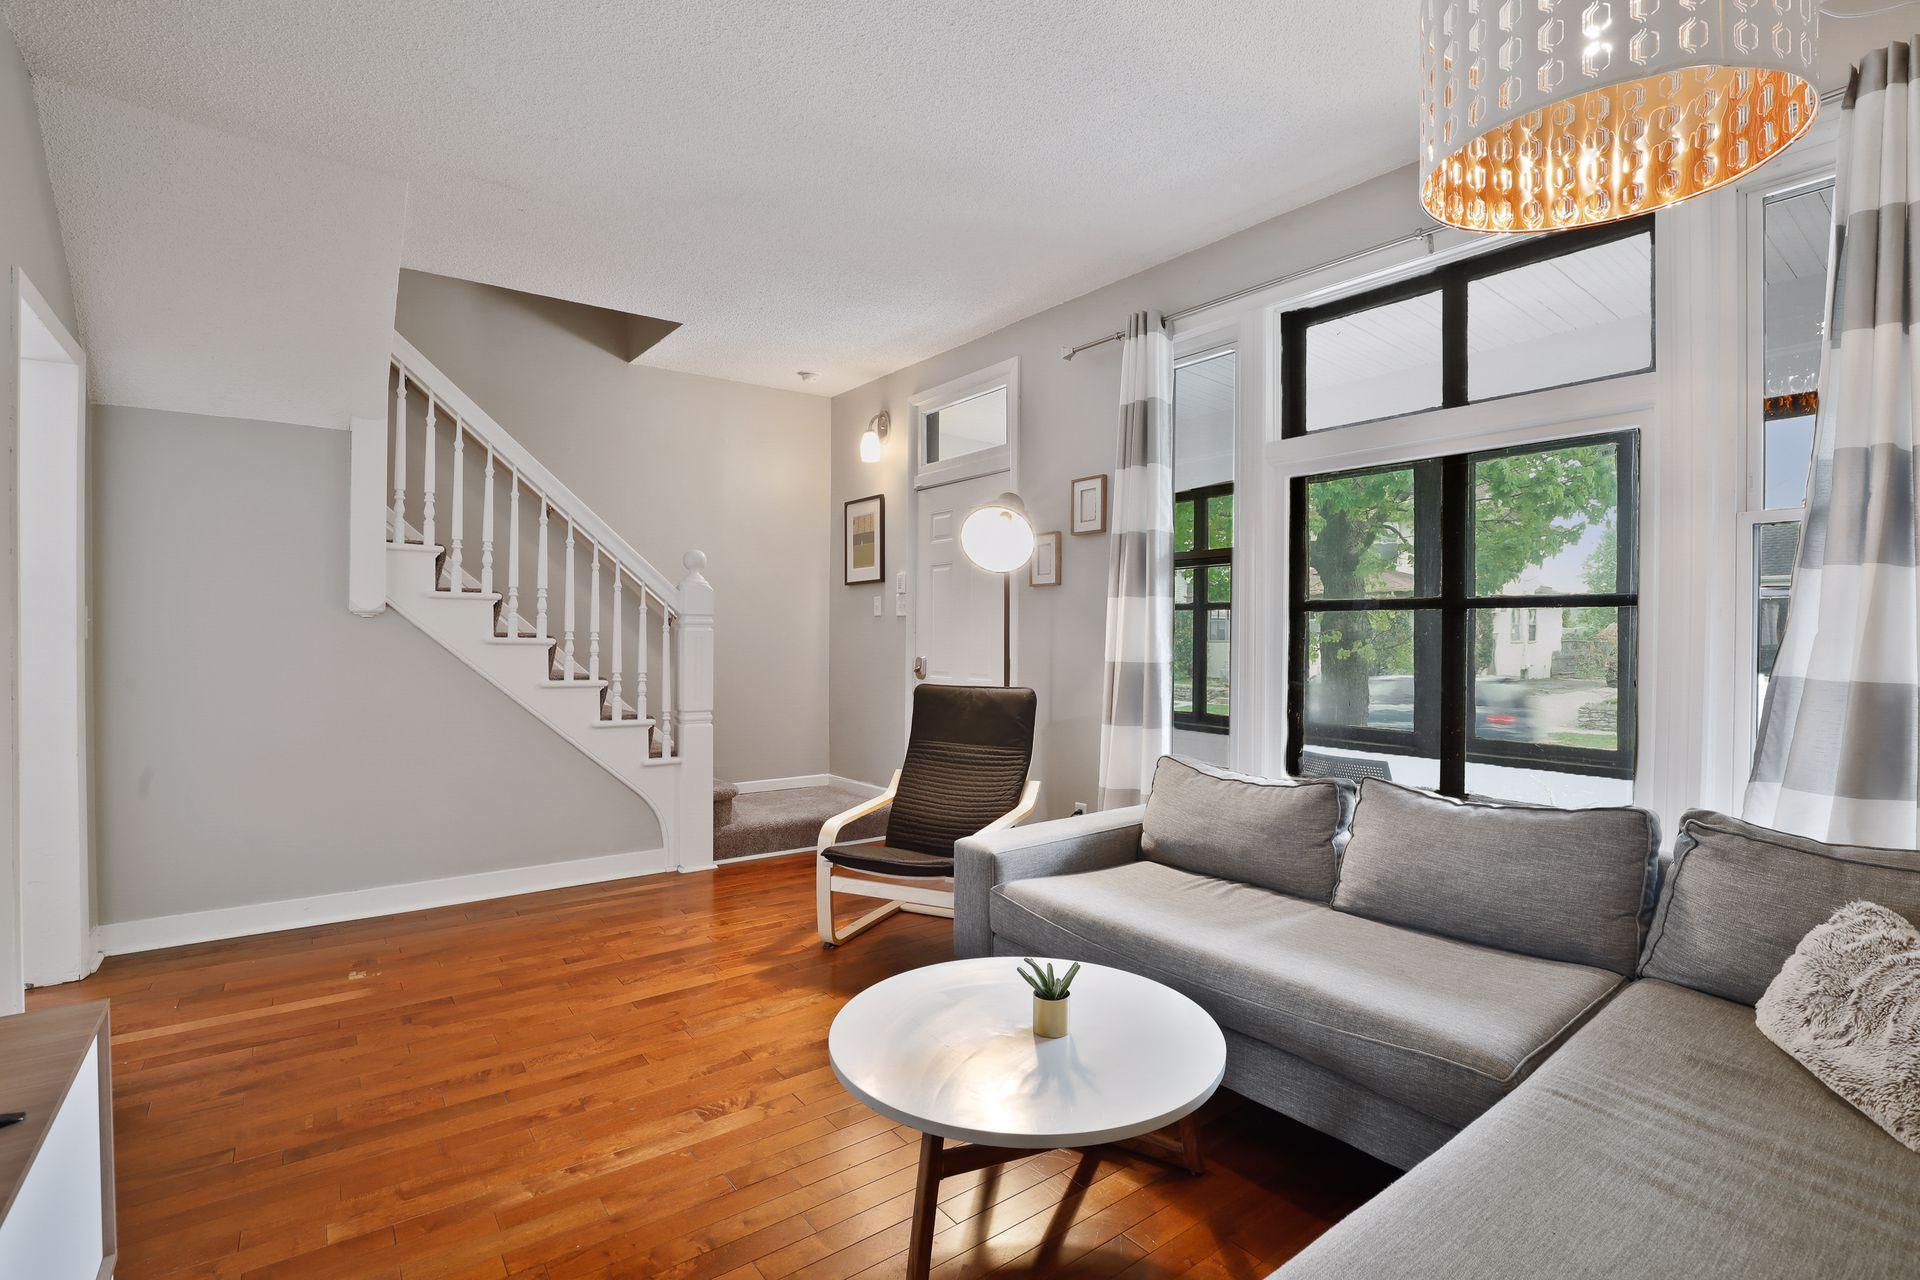 453 Saint Clair Avenue, Saint Paul, Minnesota 55102, 4 Bedrooms Bedrooms, ,2 BathroomsBathrooms,Single Family,For Sale,453 Saint Clair Avenue,5736377